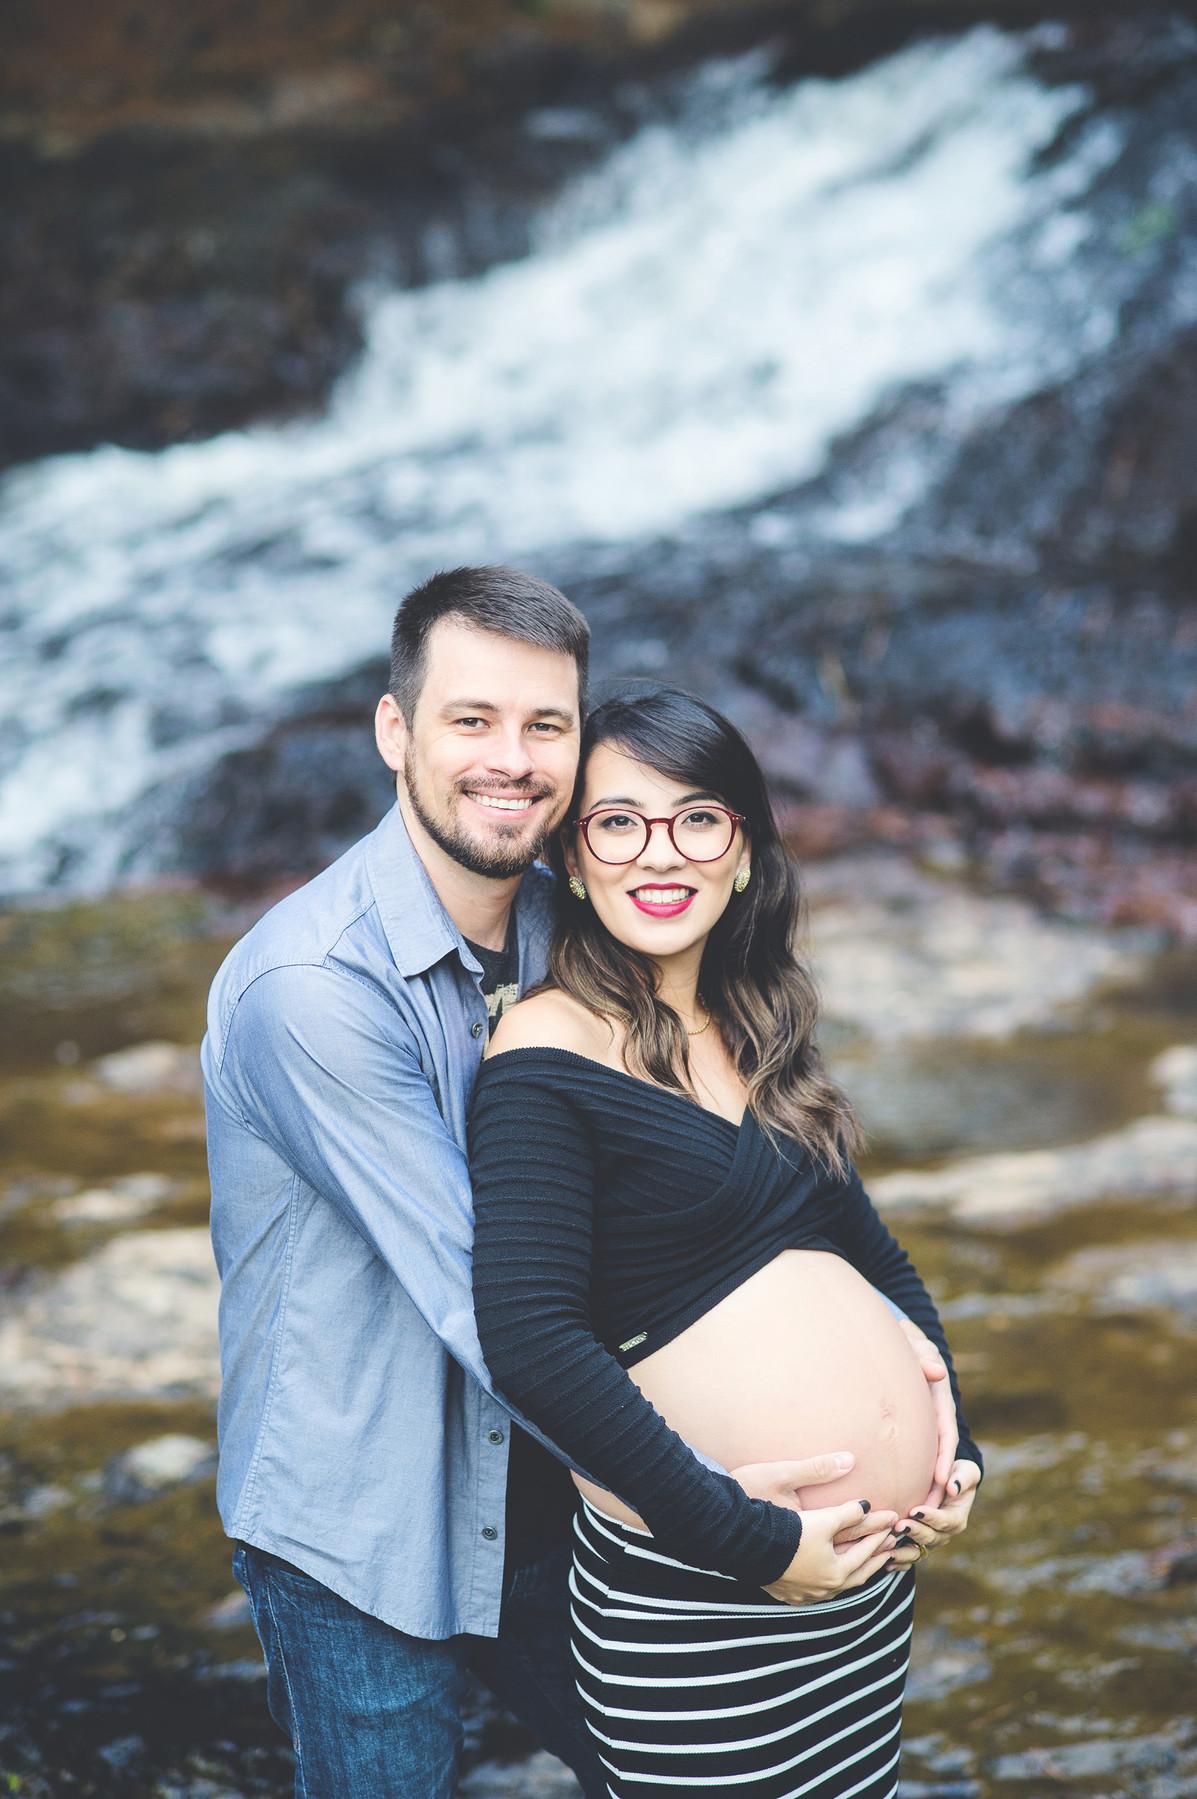 gestante - gravidez - kaory - ton - nicolas - campo alegre - chroma fotografia